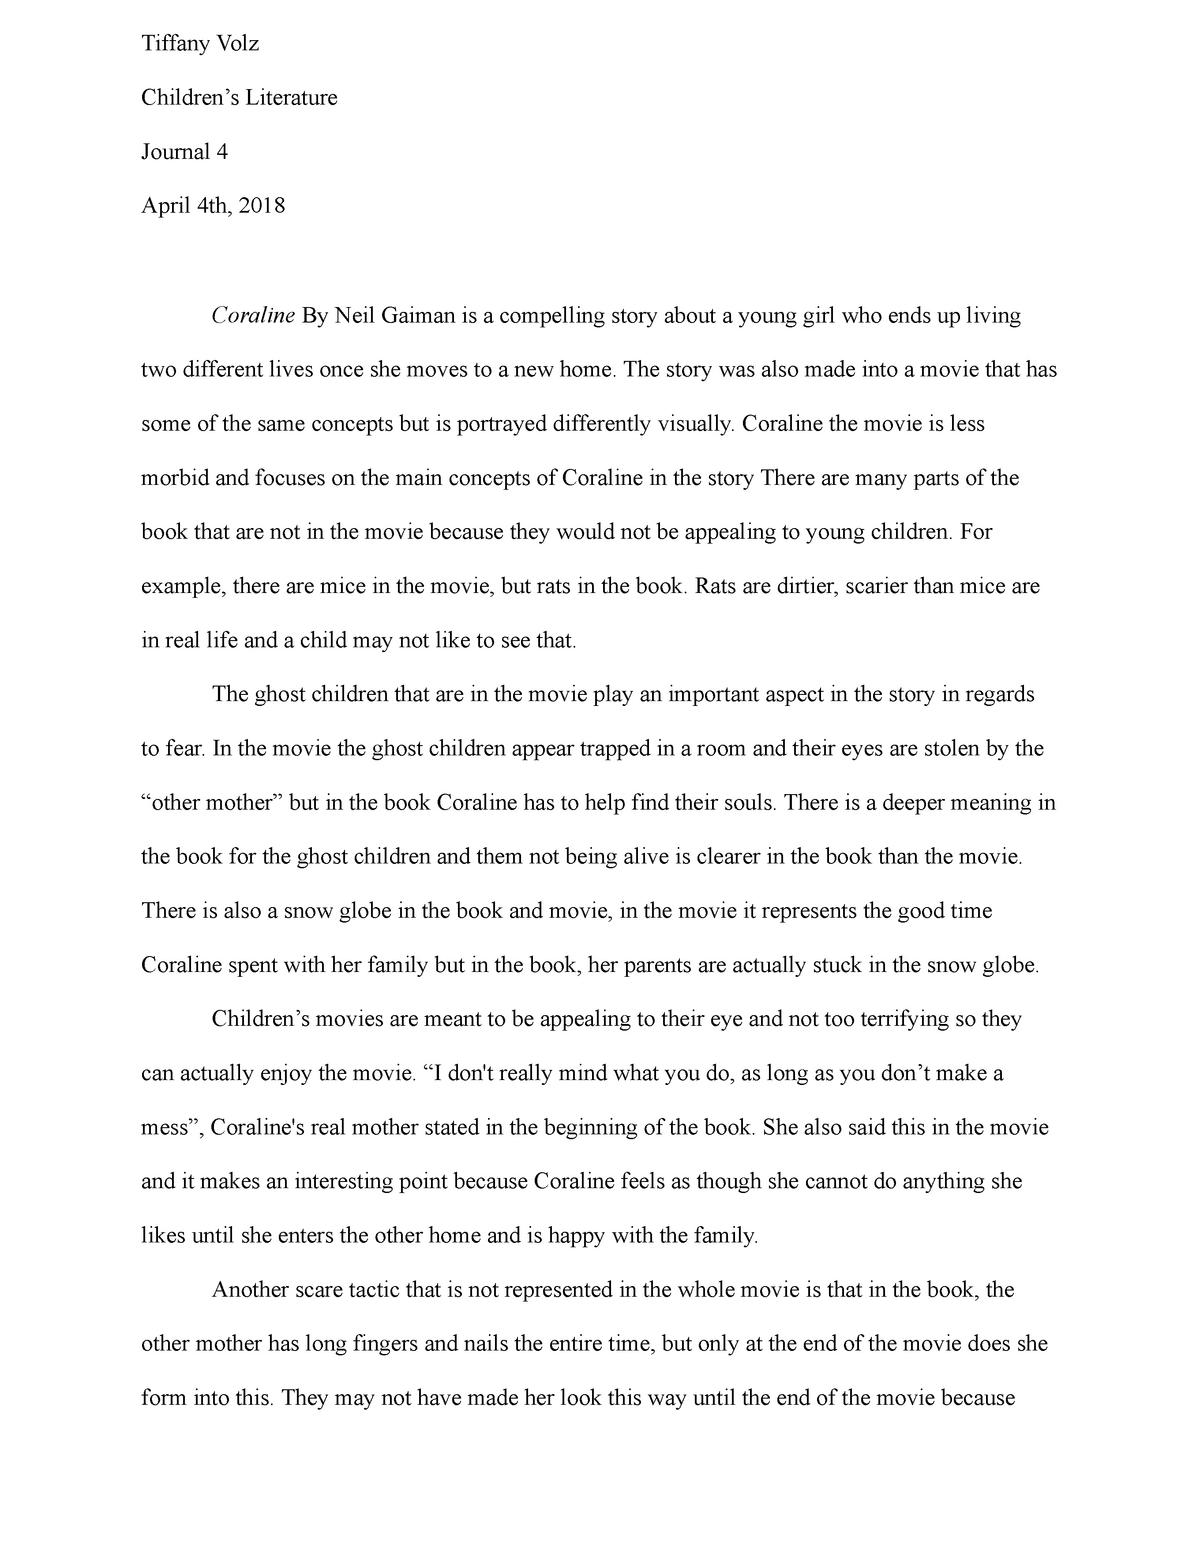 Tiffany Volz Journal 4 Grade A Eng 2250 Studocu